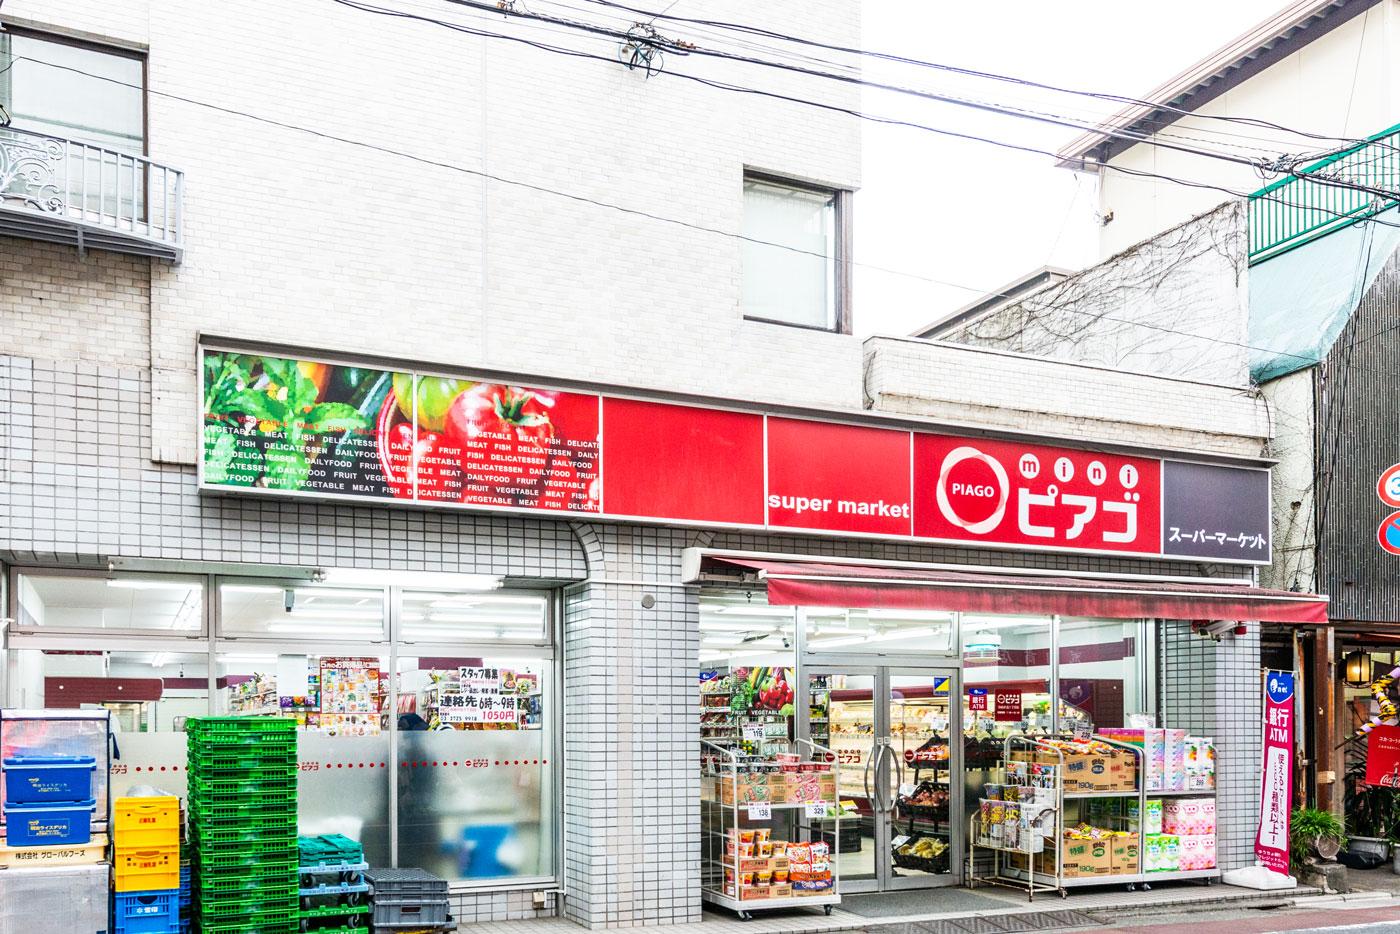 miniピアゴ自由が丘1丁目店(500m)